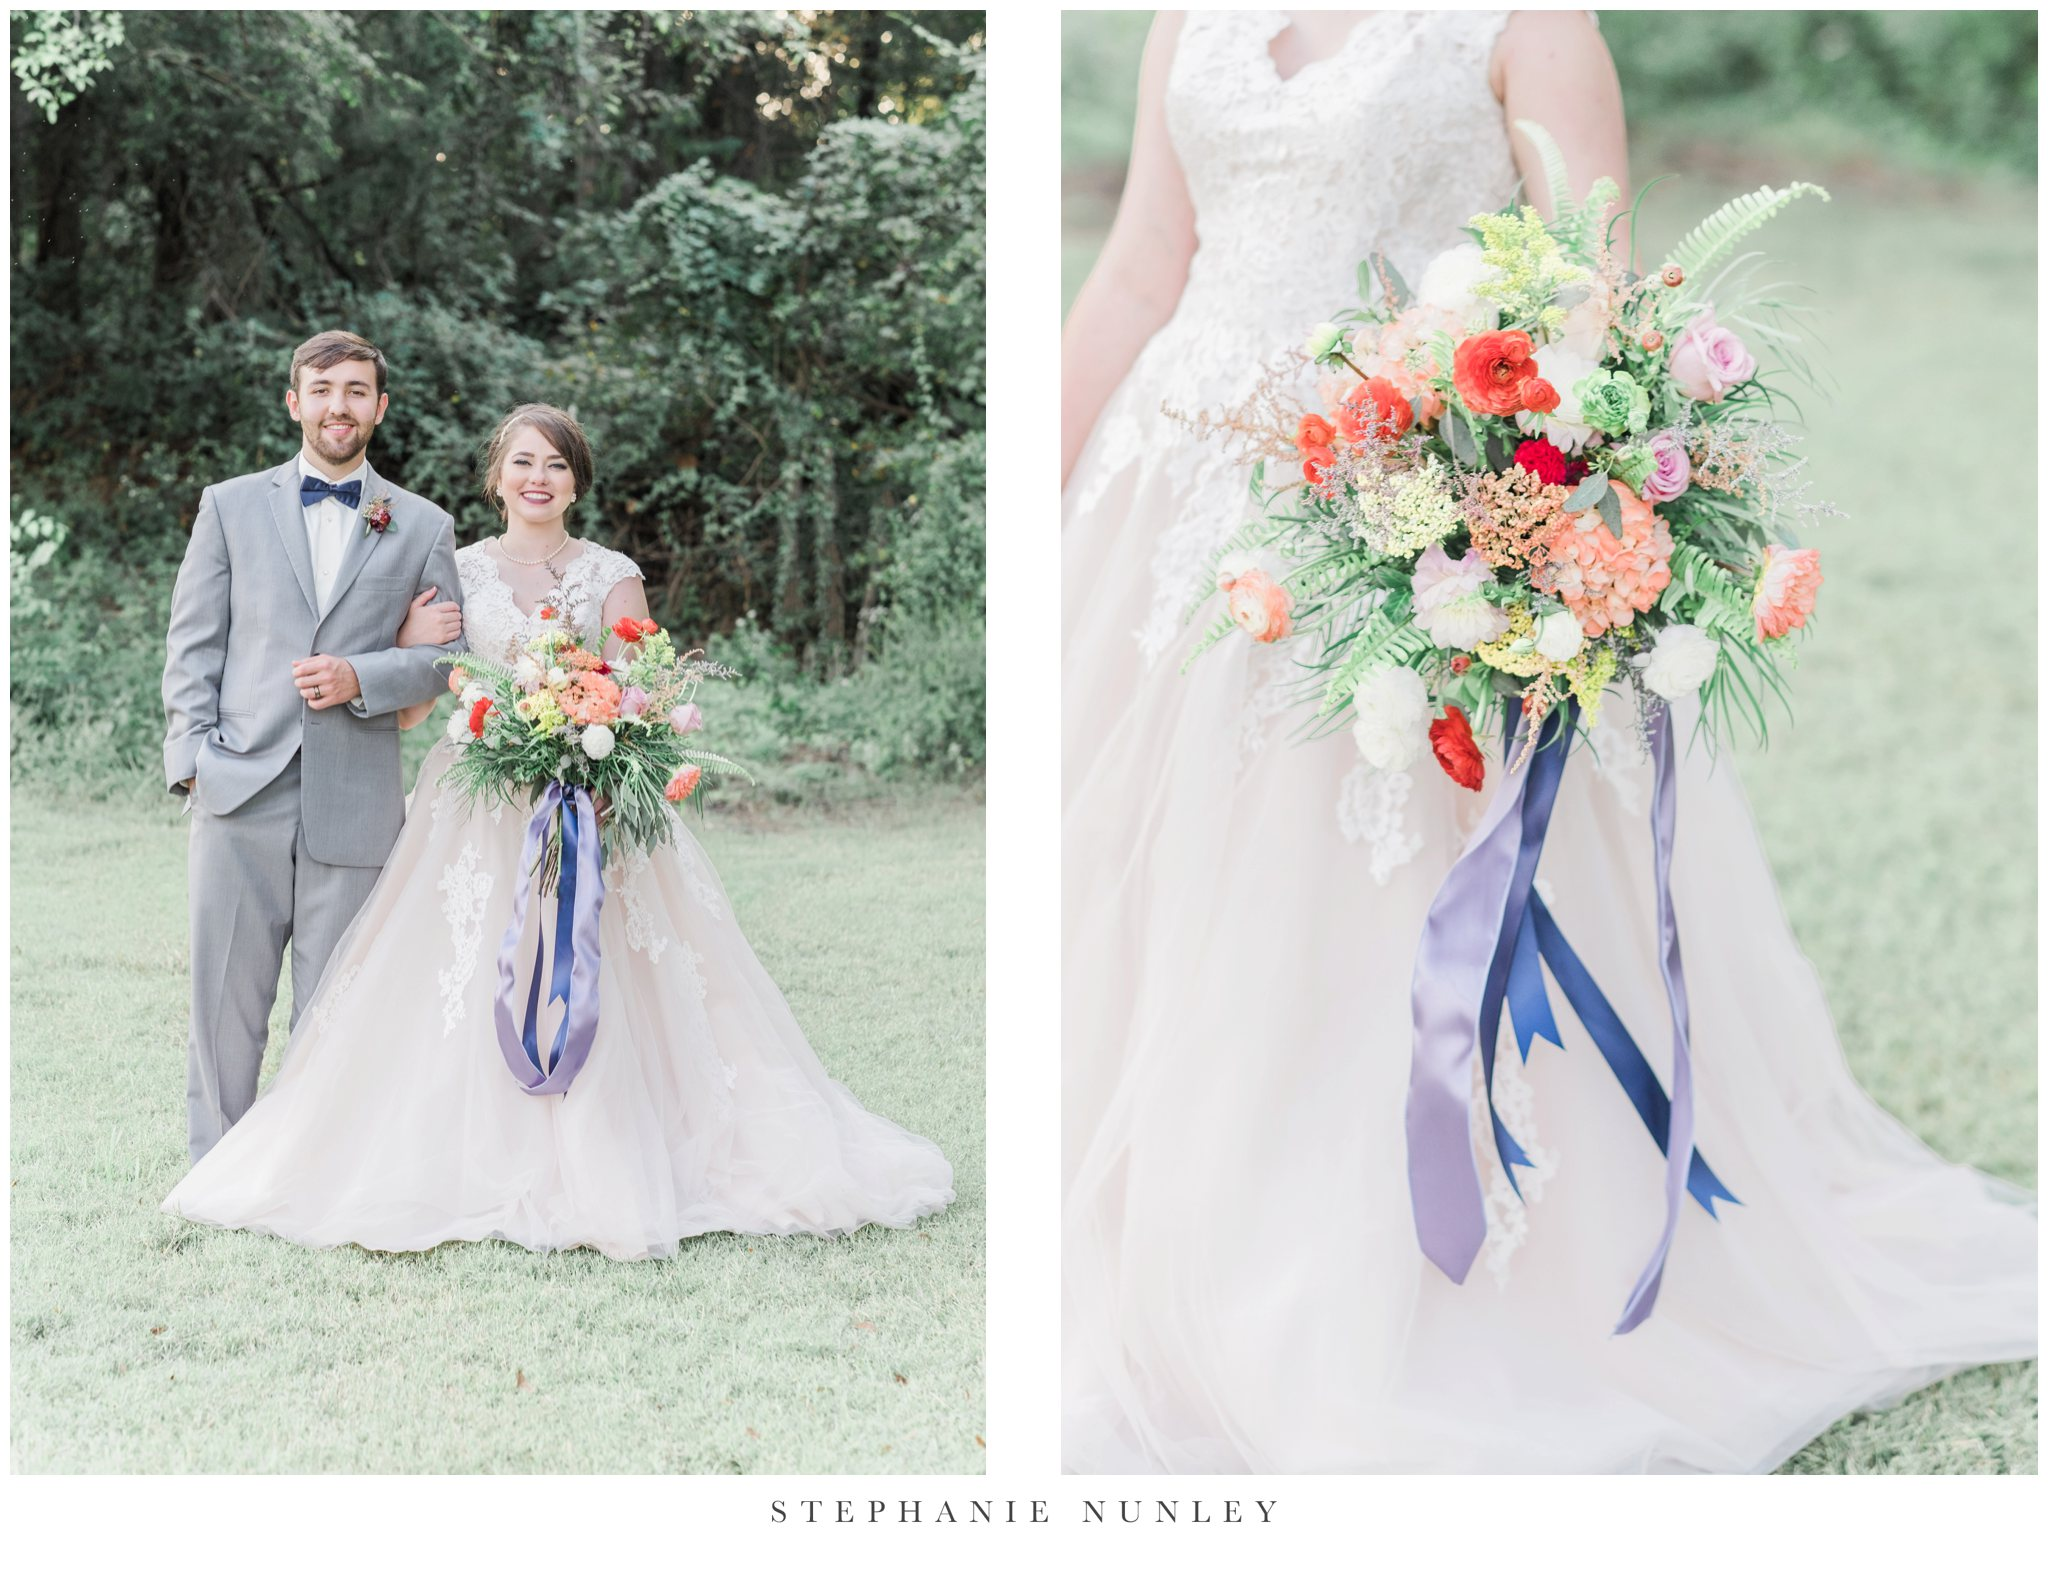 arkansas-wedding-with-lush-wildflower-bouquet-0131.jpg